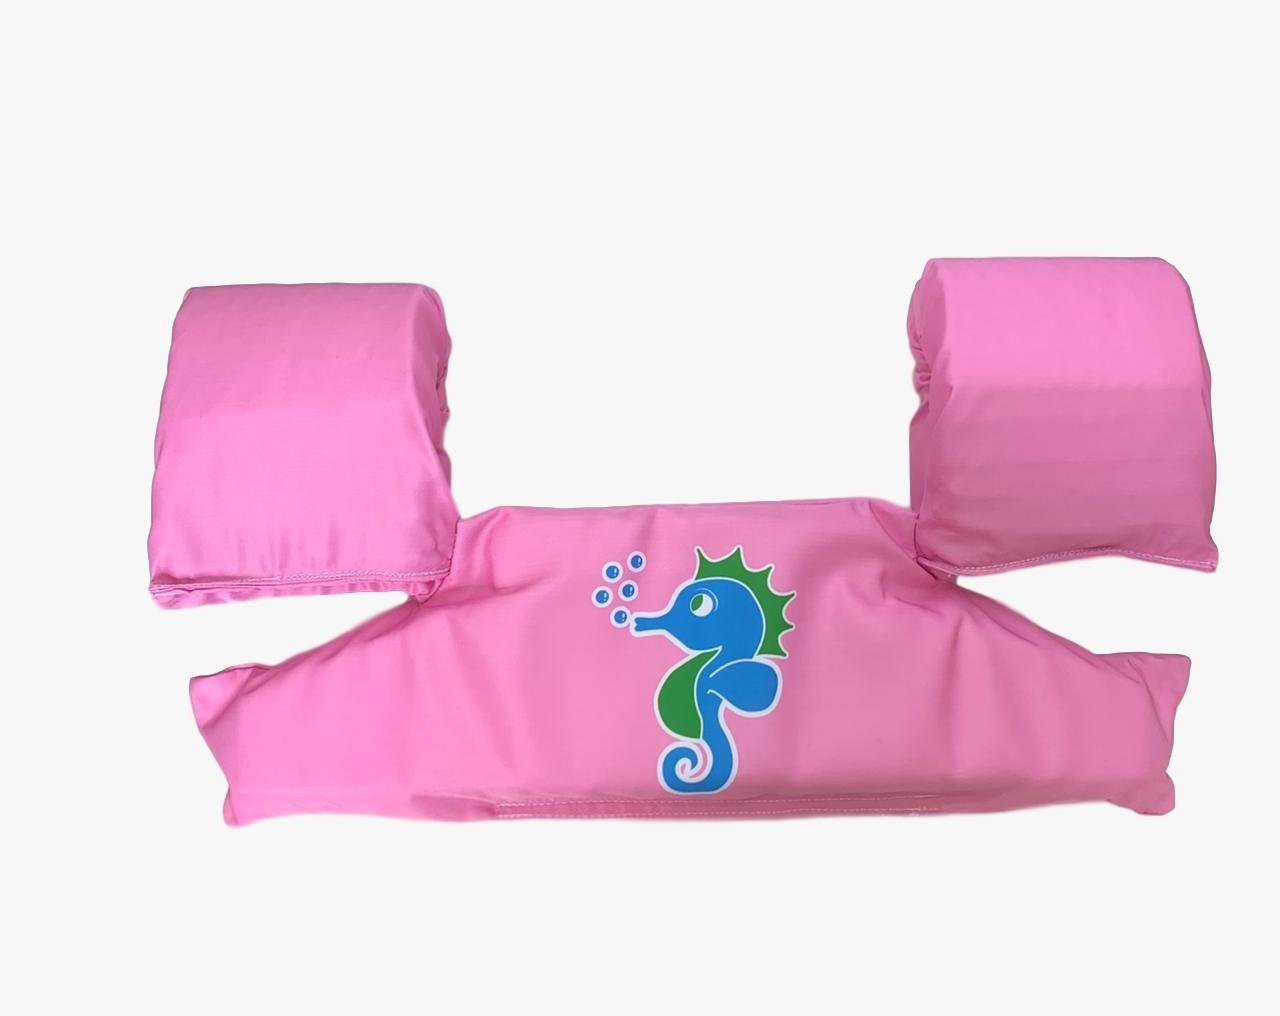 Boia Infantil  Colete Rosa - Ecoeplay